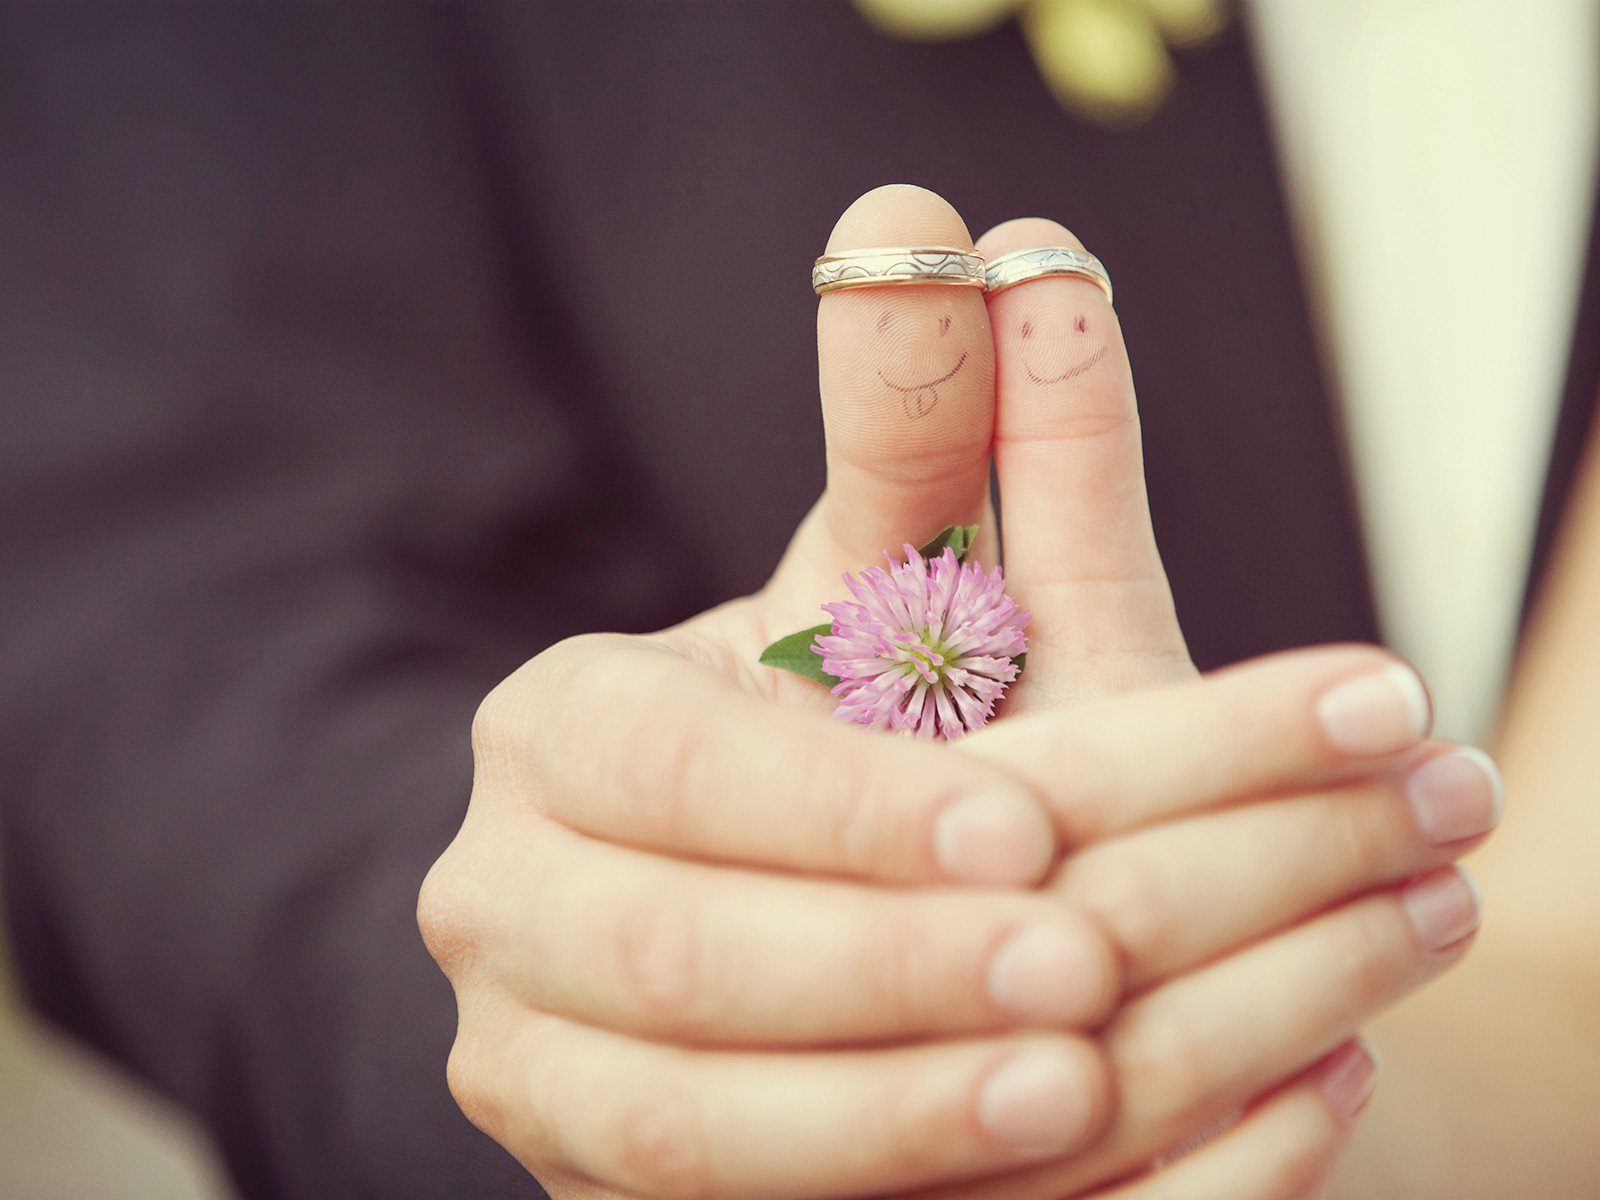 cute finger funny cute love couple wallpaper | 1600x1200 | 801159